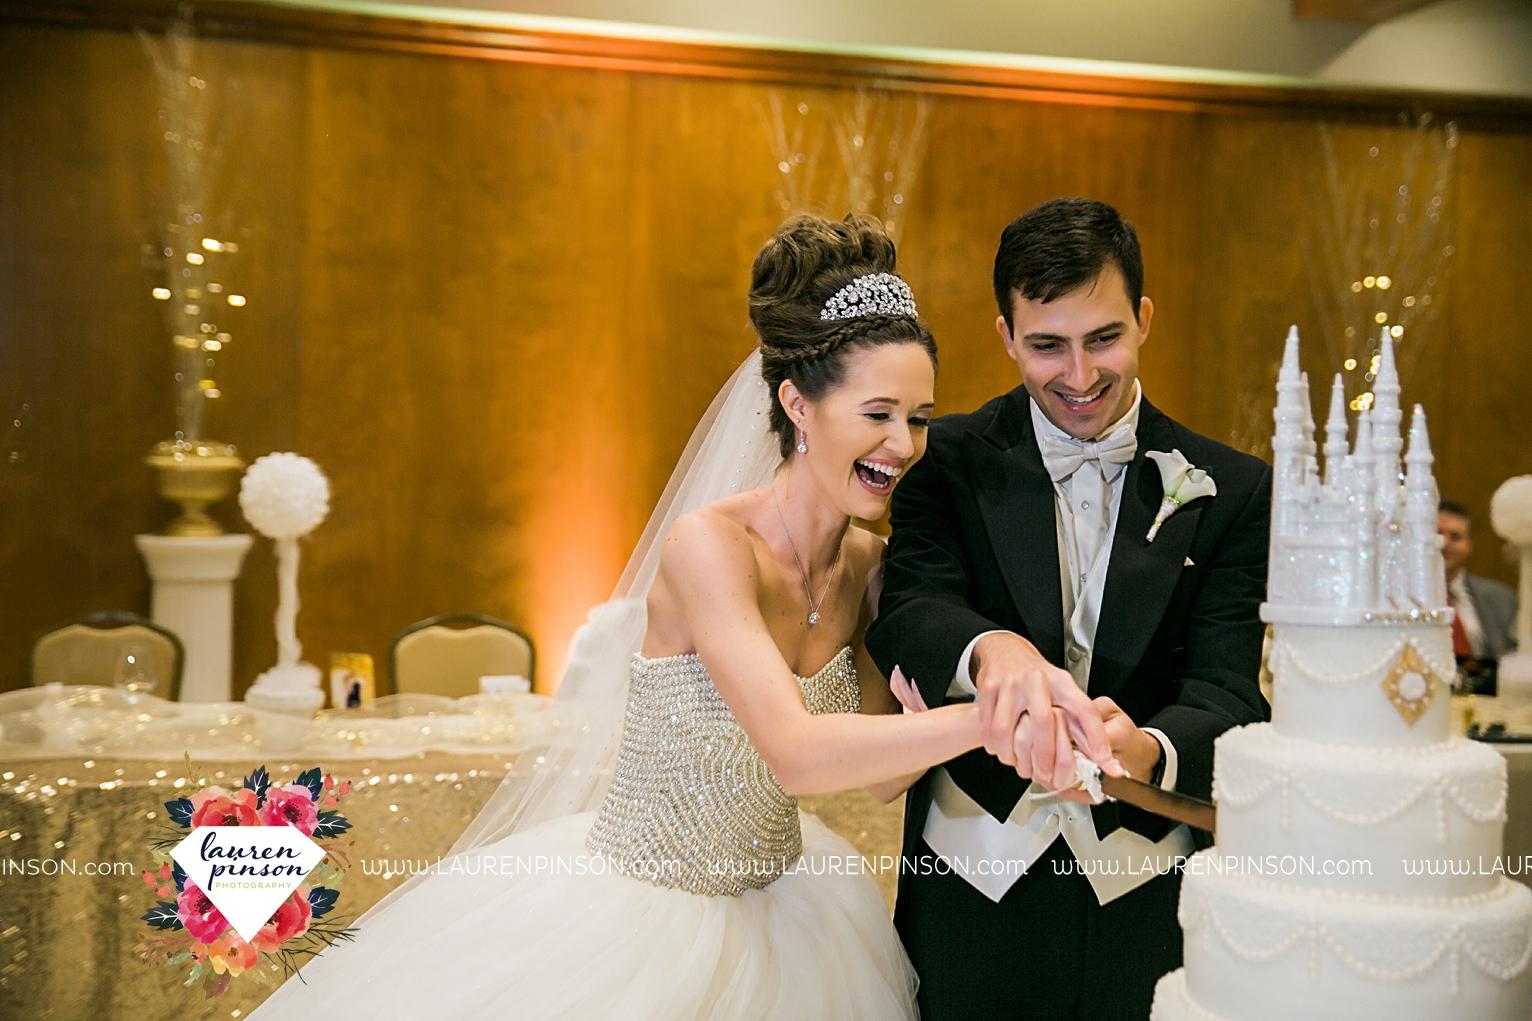 wichita-falls-texas-wedding-photographer-the-forum-by-the-kemp-mayfield-events-ulta-gold-glitter_2876.jpg